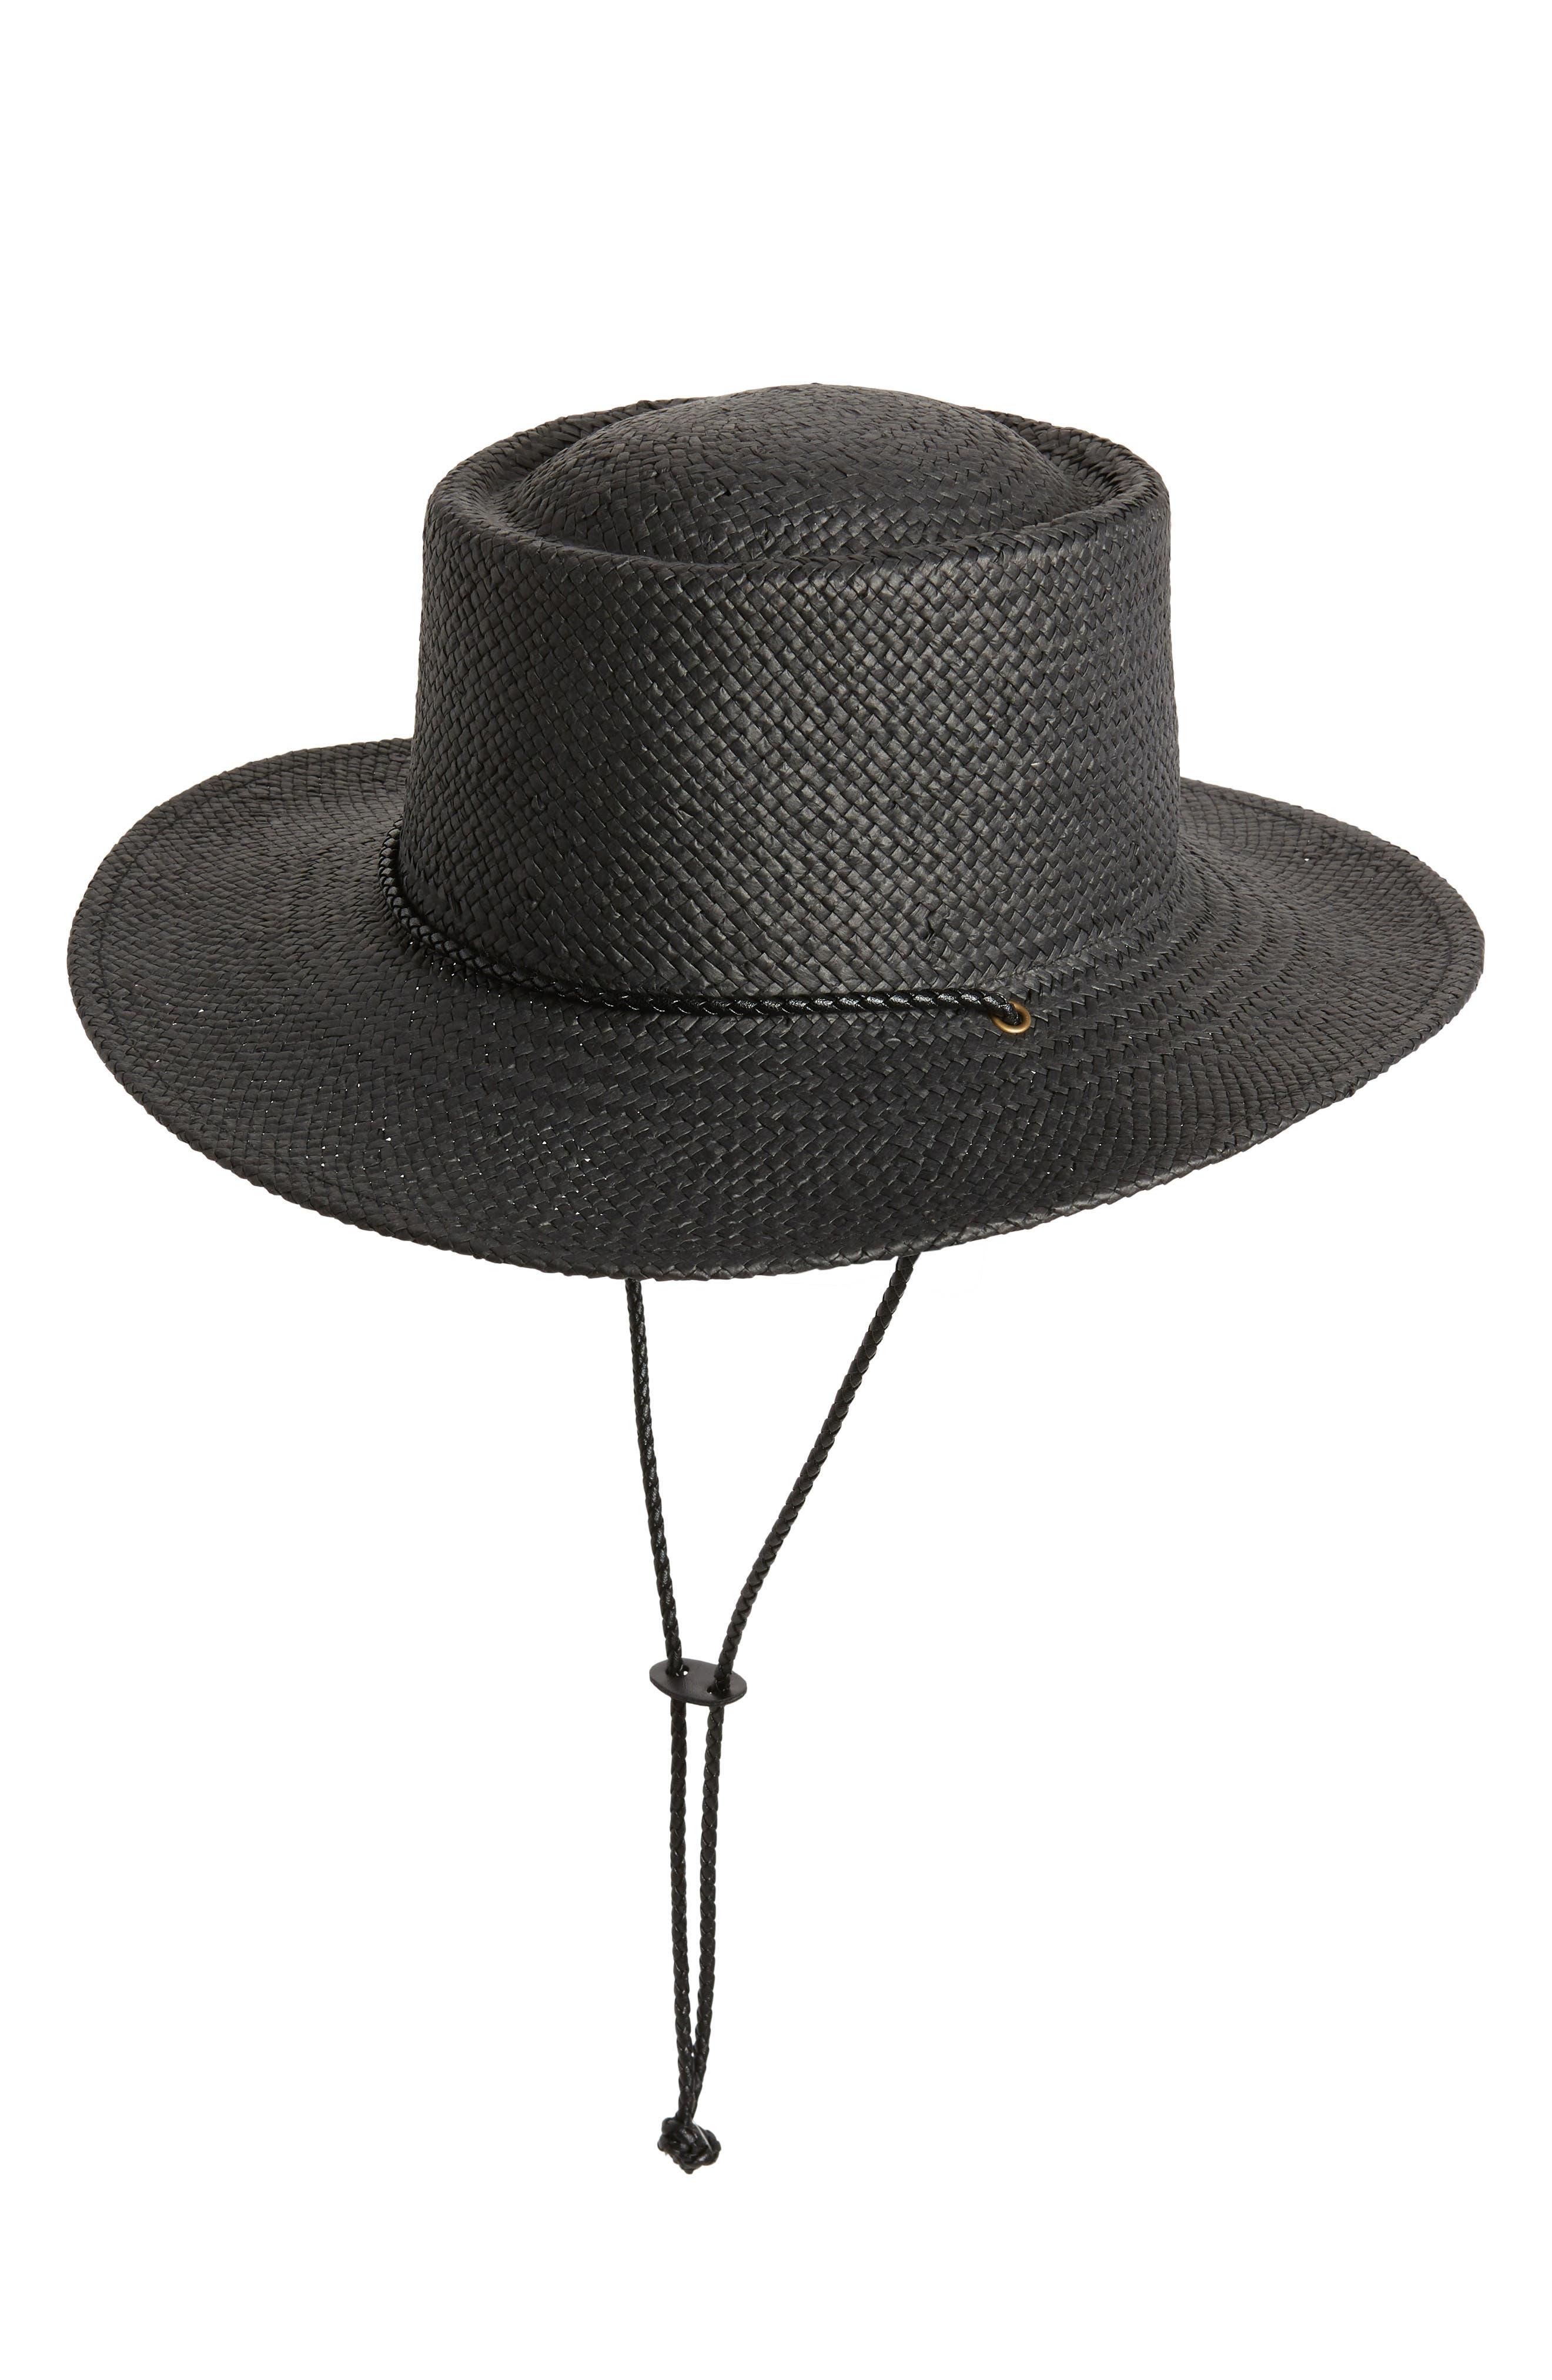 TREASURE & BOND, Woven Boater Hat, Main thumbnail 1, color, BLACK